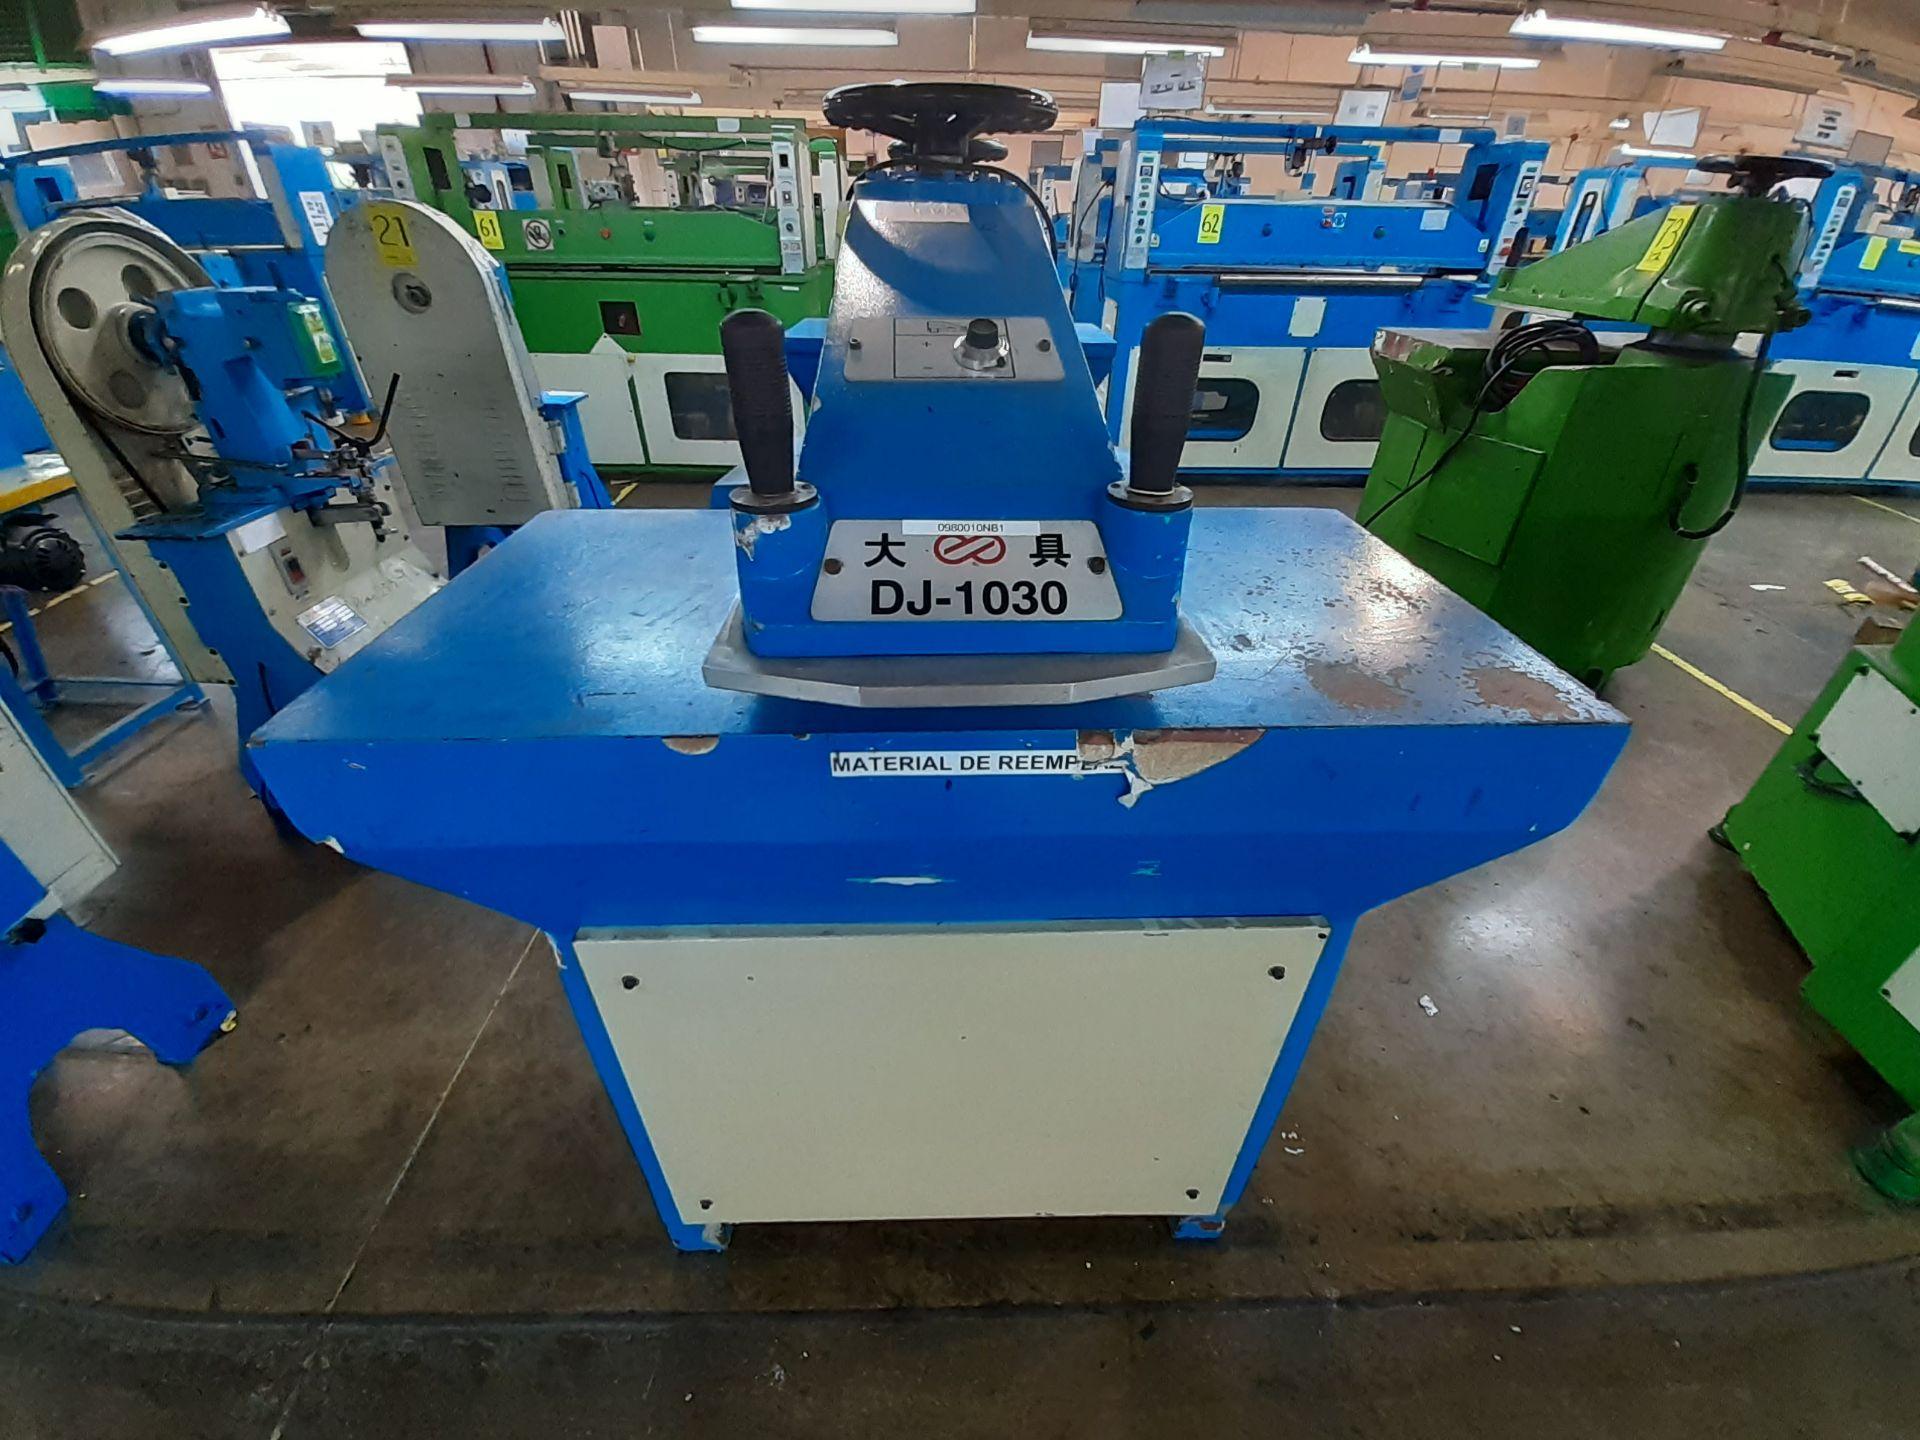 (2) Prensas de corte hidráulica de brazo oscilante, marca Dong guan Dah Dine Machine, Modelo: DJ-103 - Image 12 of 17